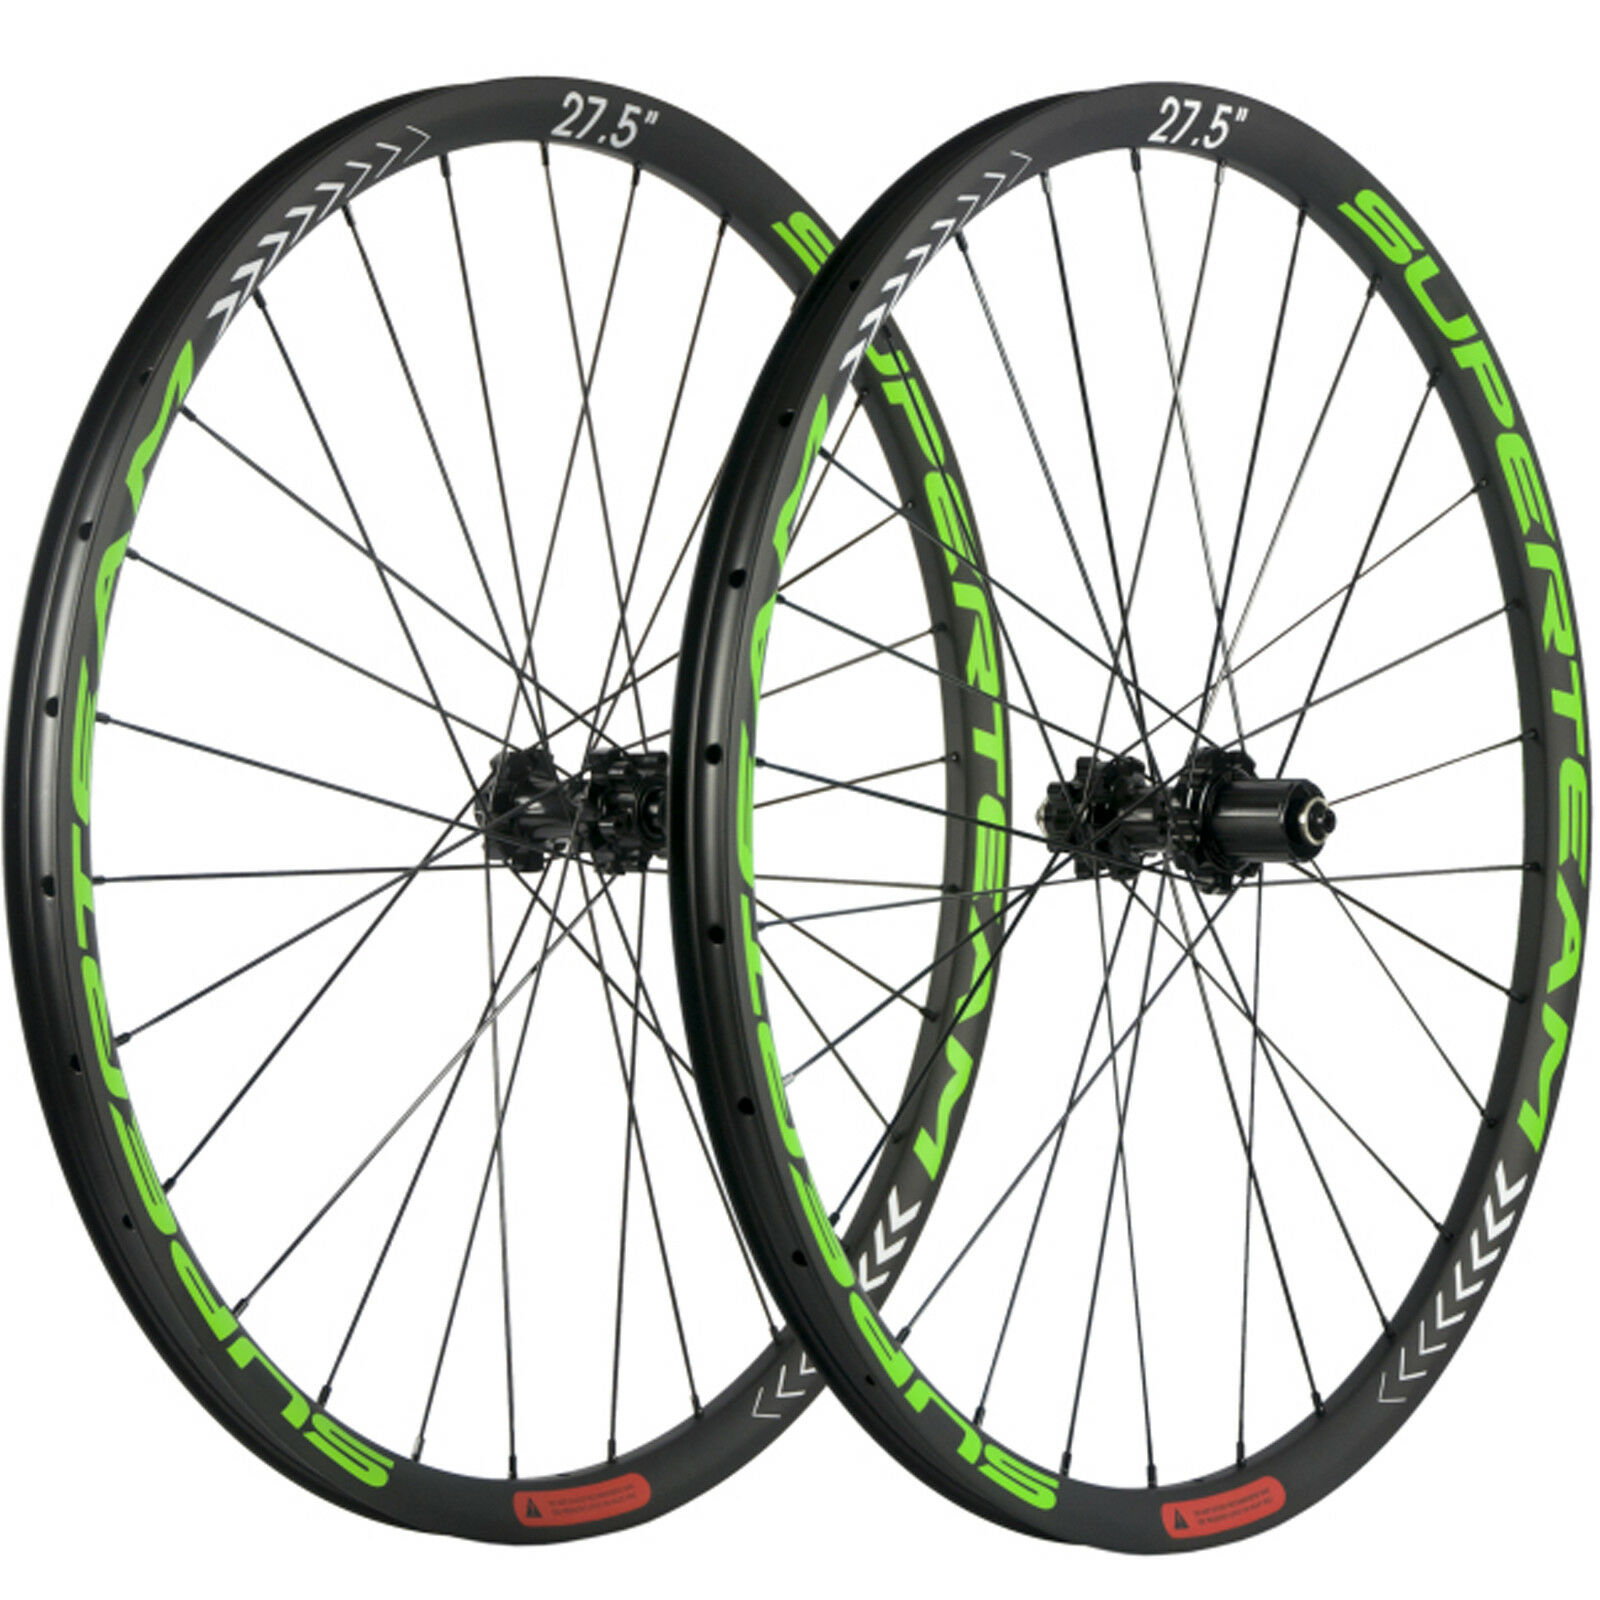 SUPERTEAM 27.5ER  Carbon MTB Wheelset 6 Bolts Mountain Bike Carbon Wheels UD Matt  shop online today